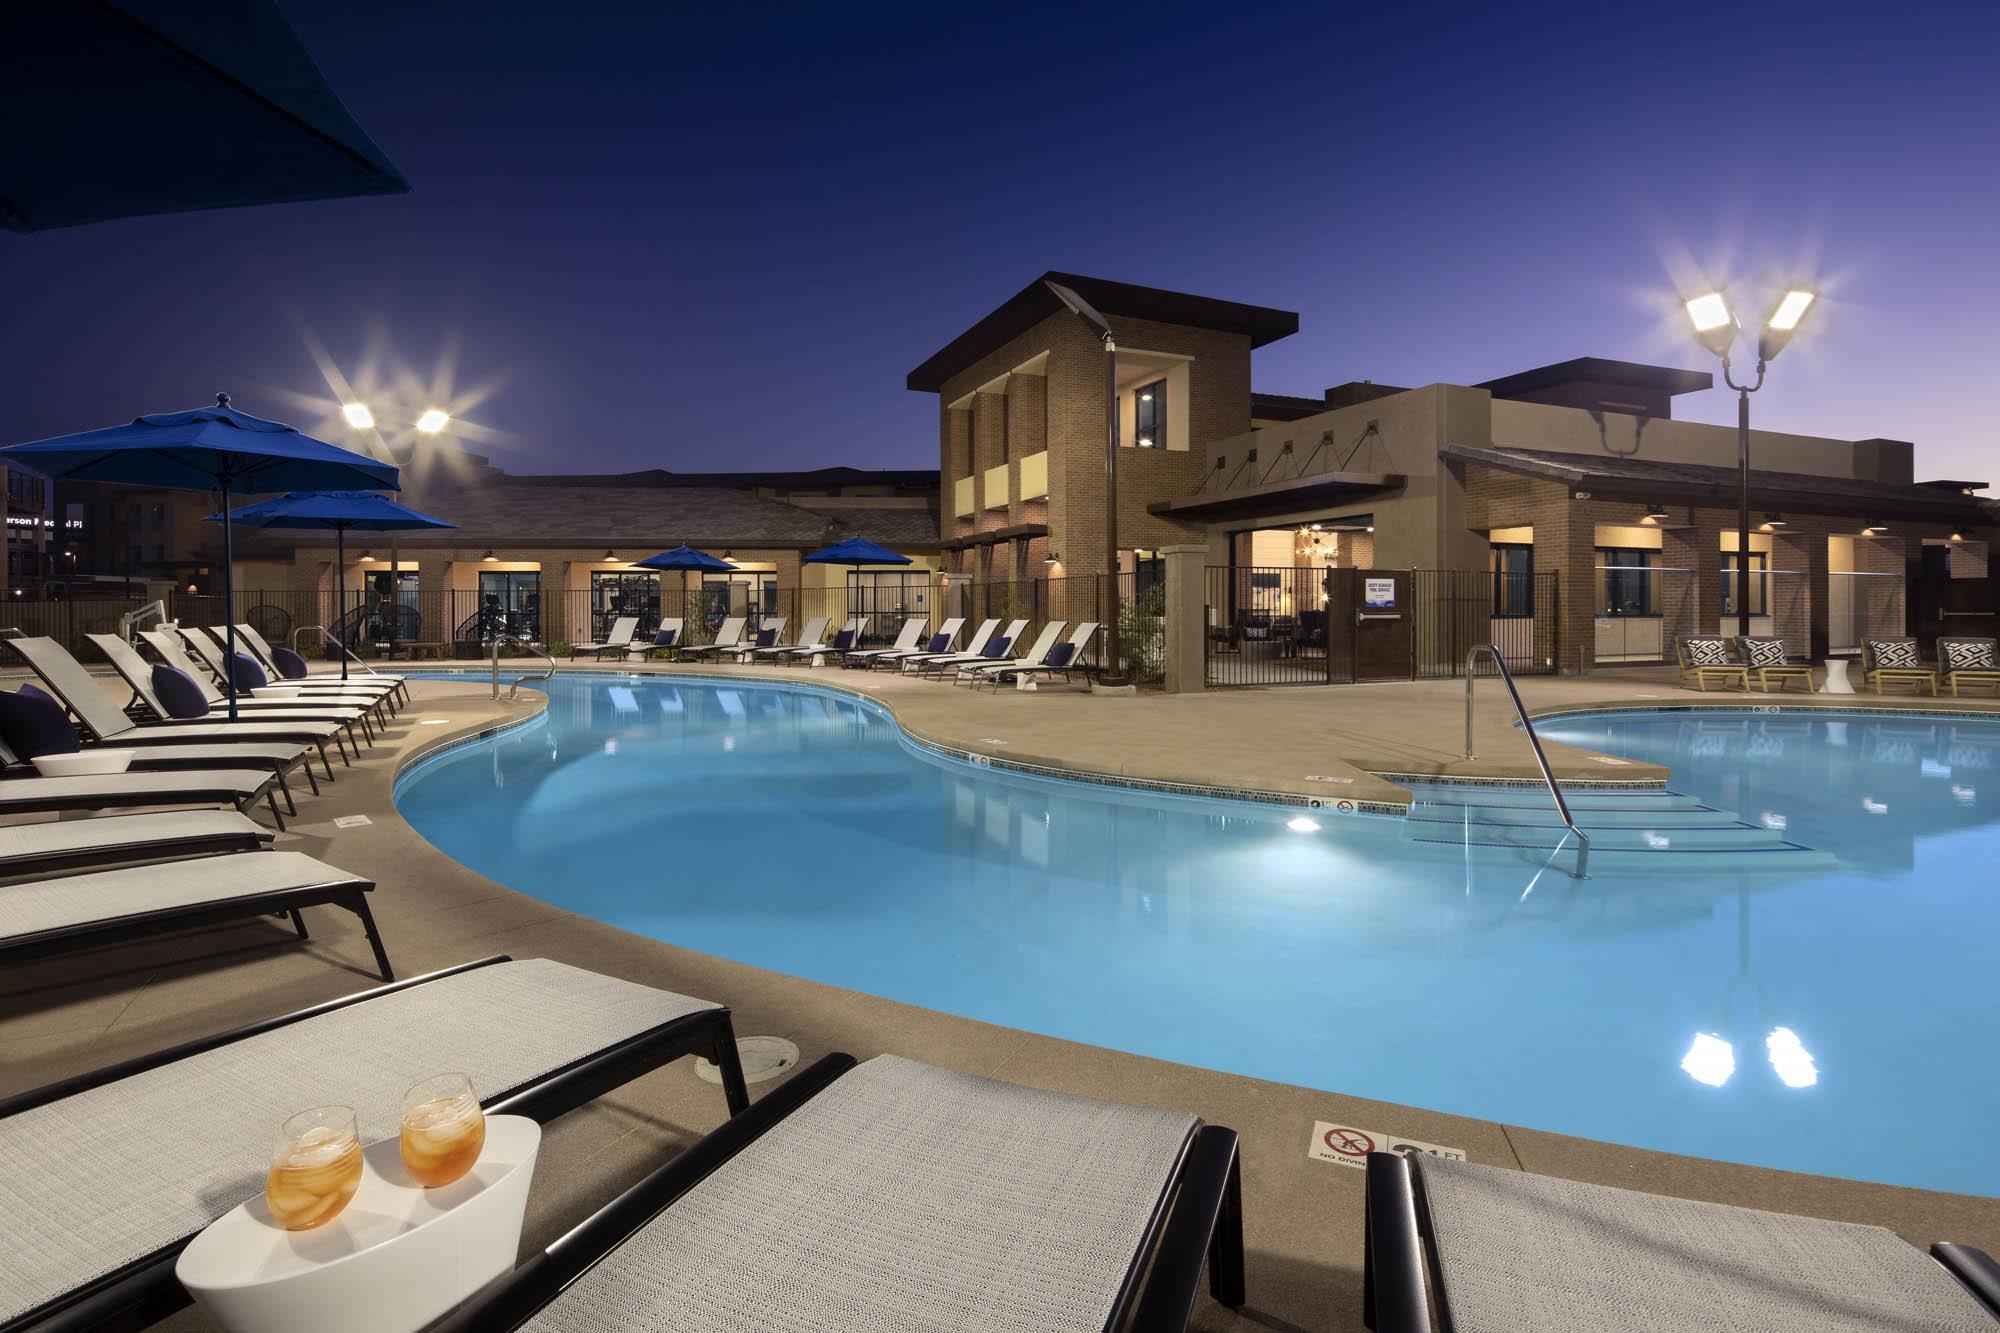 Sparkling Pool & Spa Deck